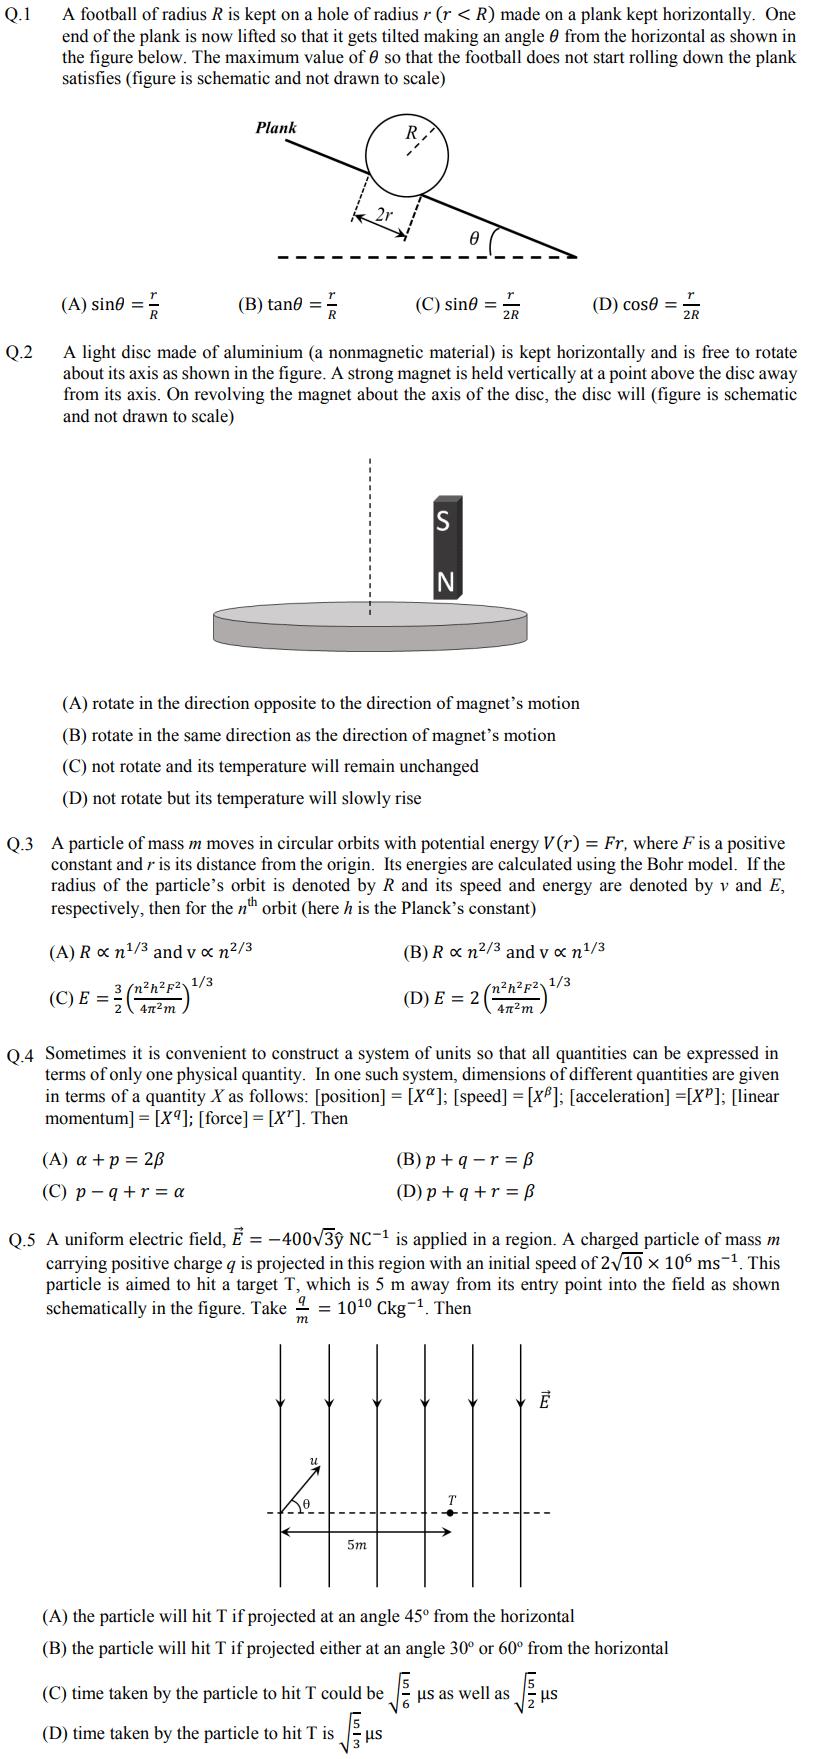 JEE Advanced Physics Sample Paper 2020